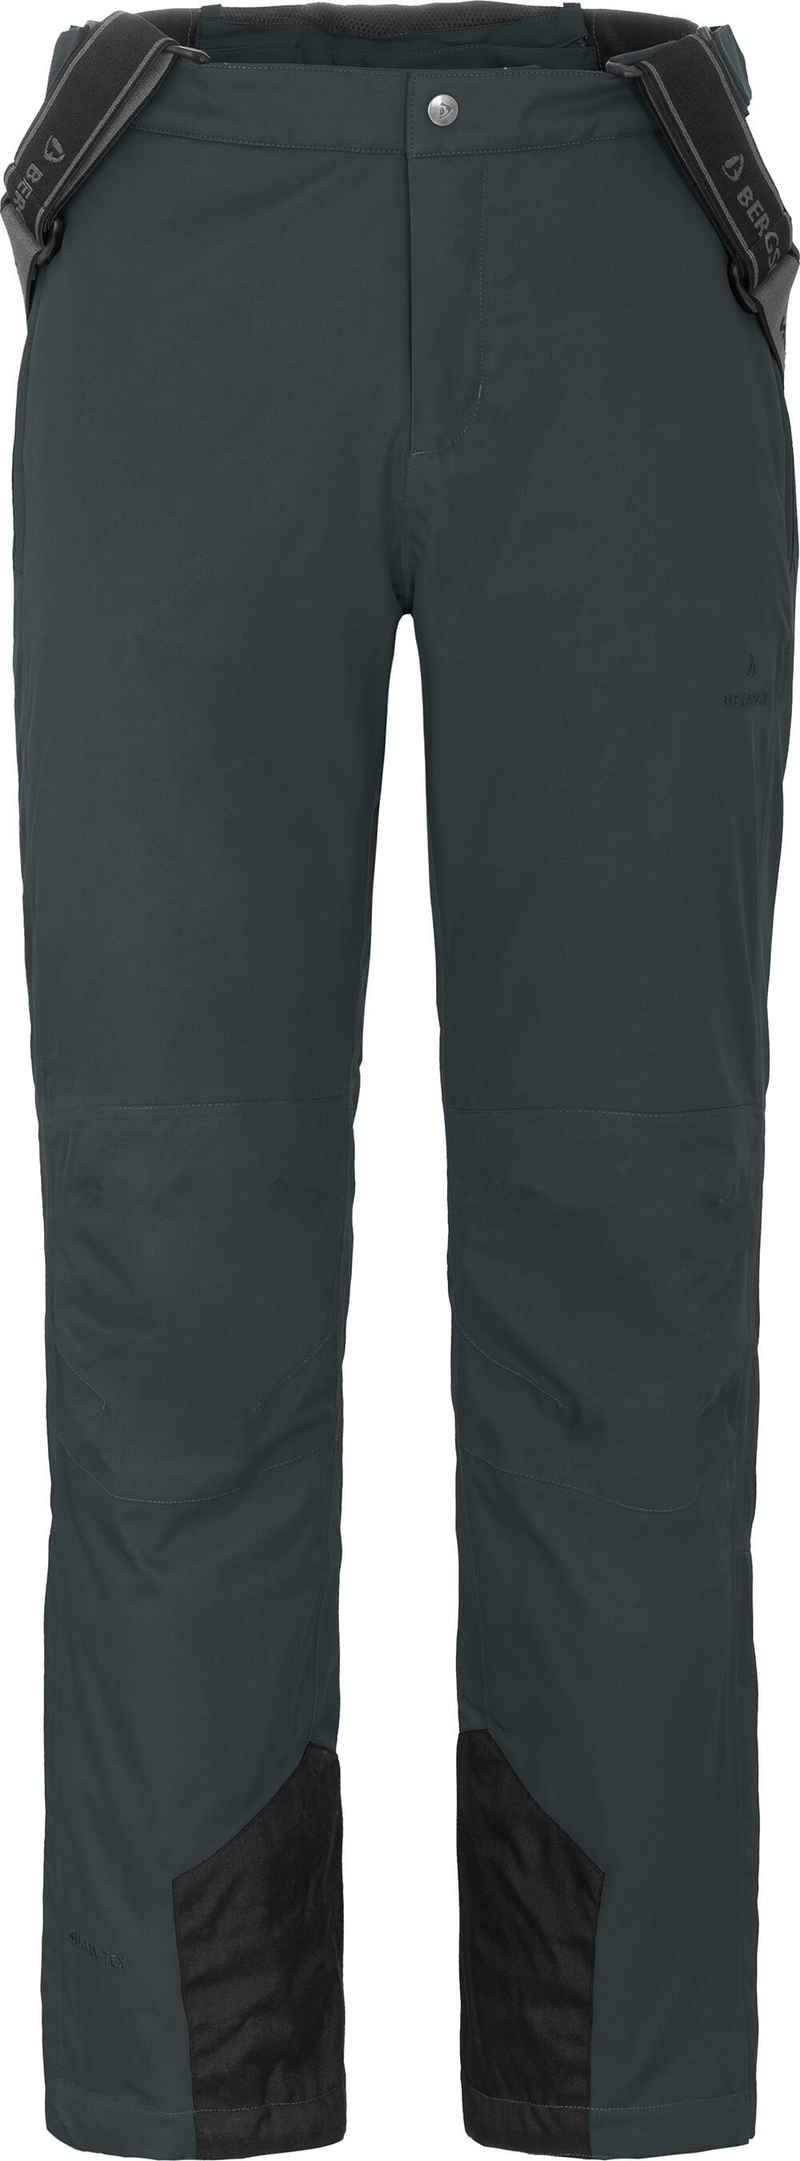 Bergson Skihose »FROSTY RACE« Herren Skihose, elastisch, 12000 mm Wassersäule, Normalgrößen, dunkel grau